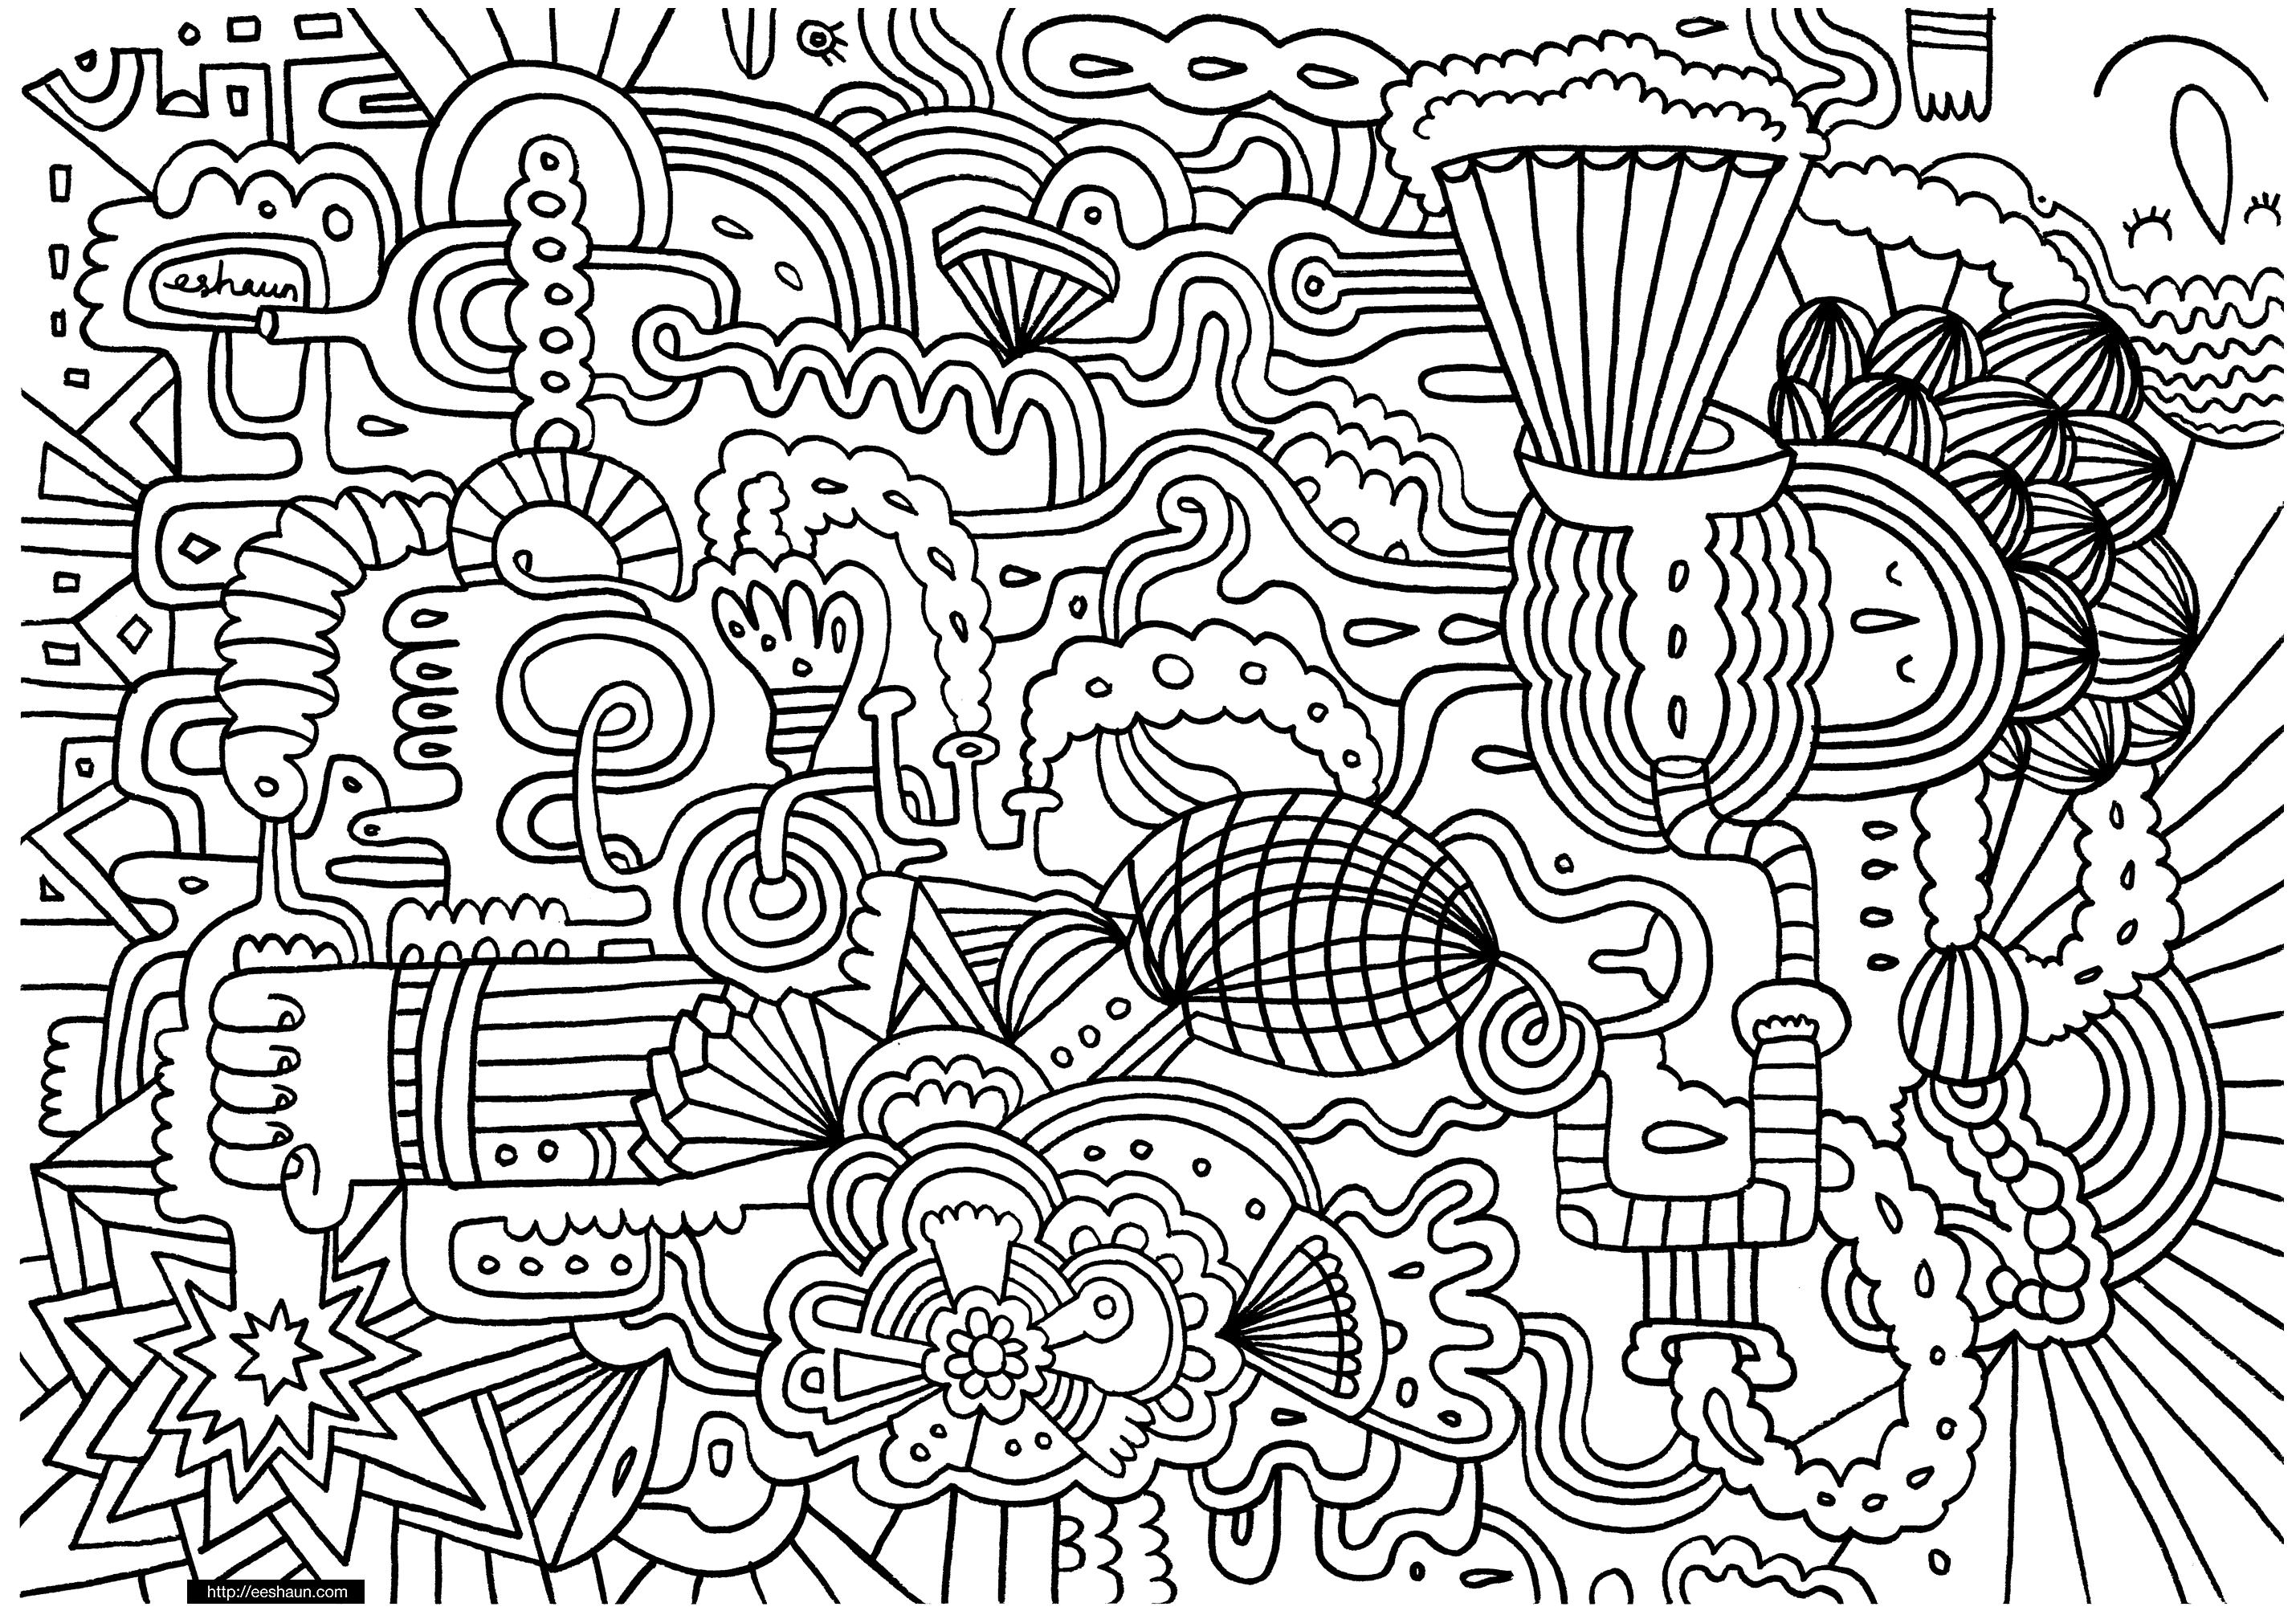 Doodle Art For Children - Doodle Art Kids Coloring Pages - Free Printable Doodle Art Coloring Pages